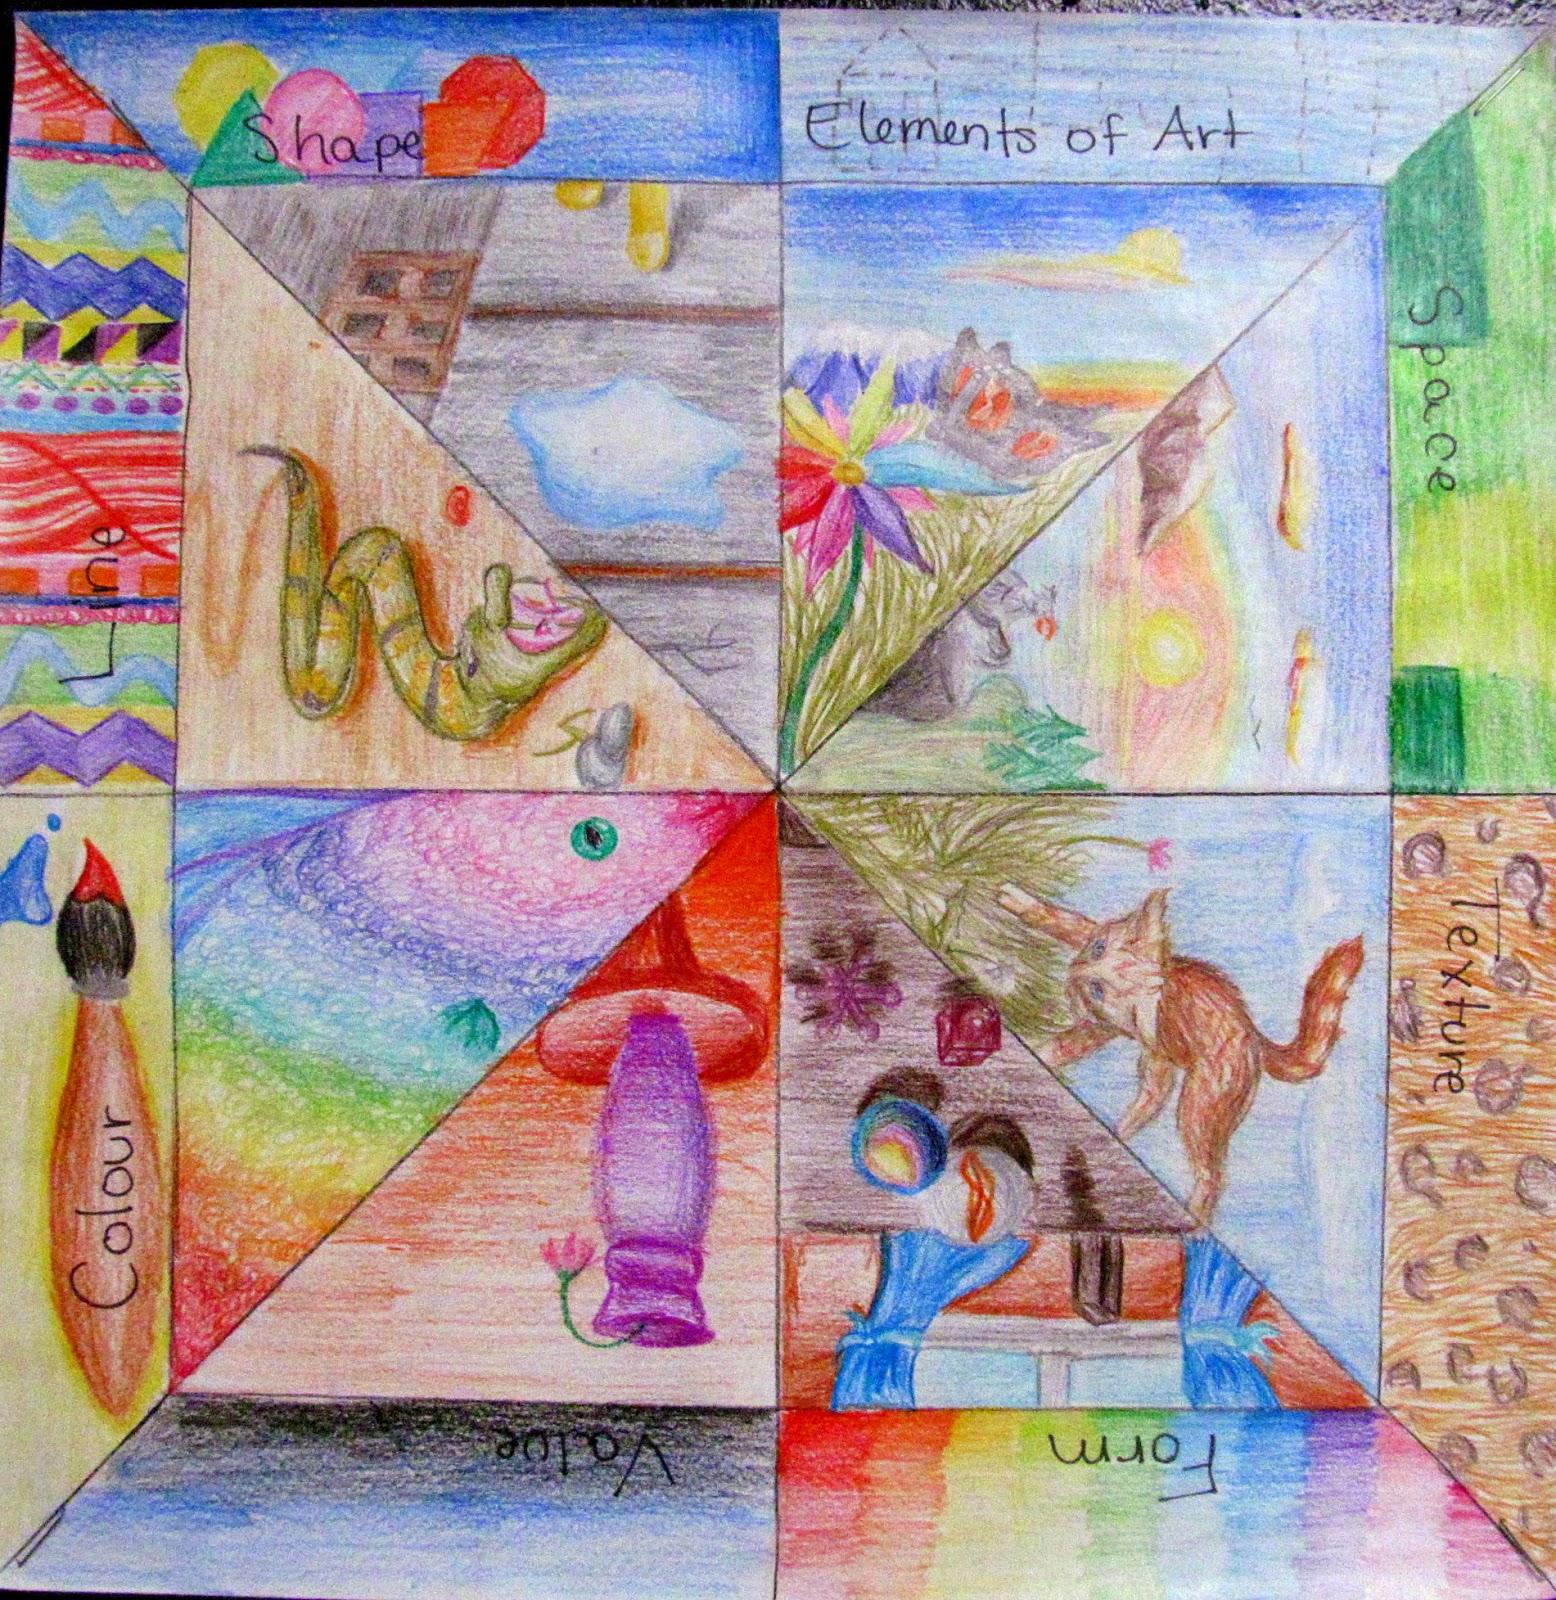 Ms Eaton S Phileonia Artonian Elements Of Art Radial Review